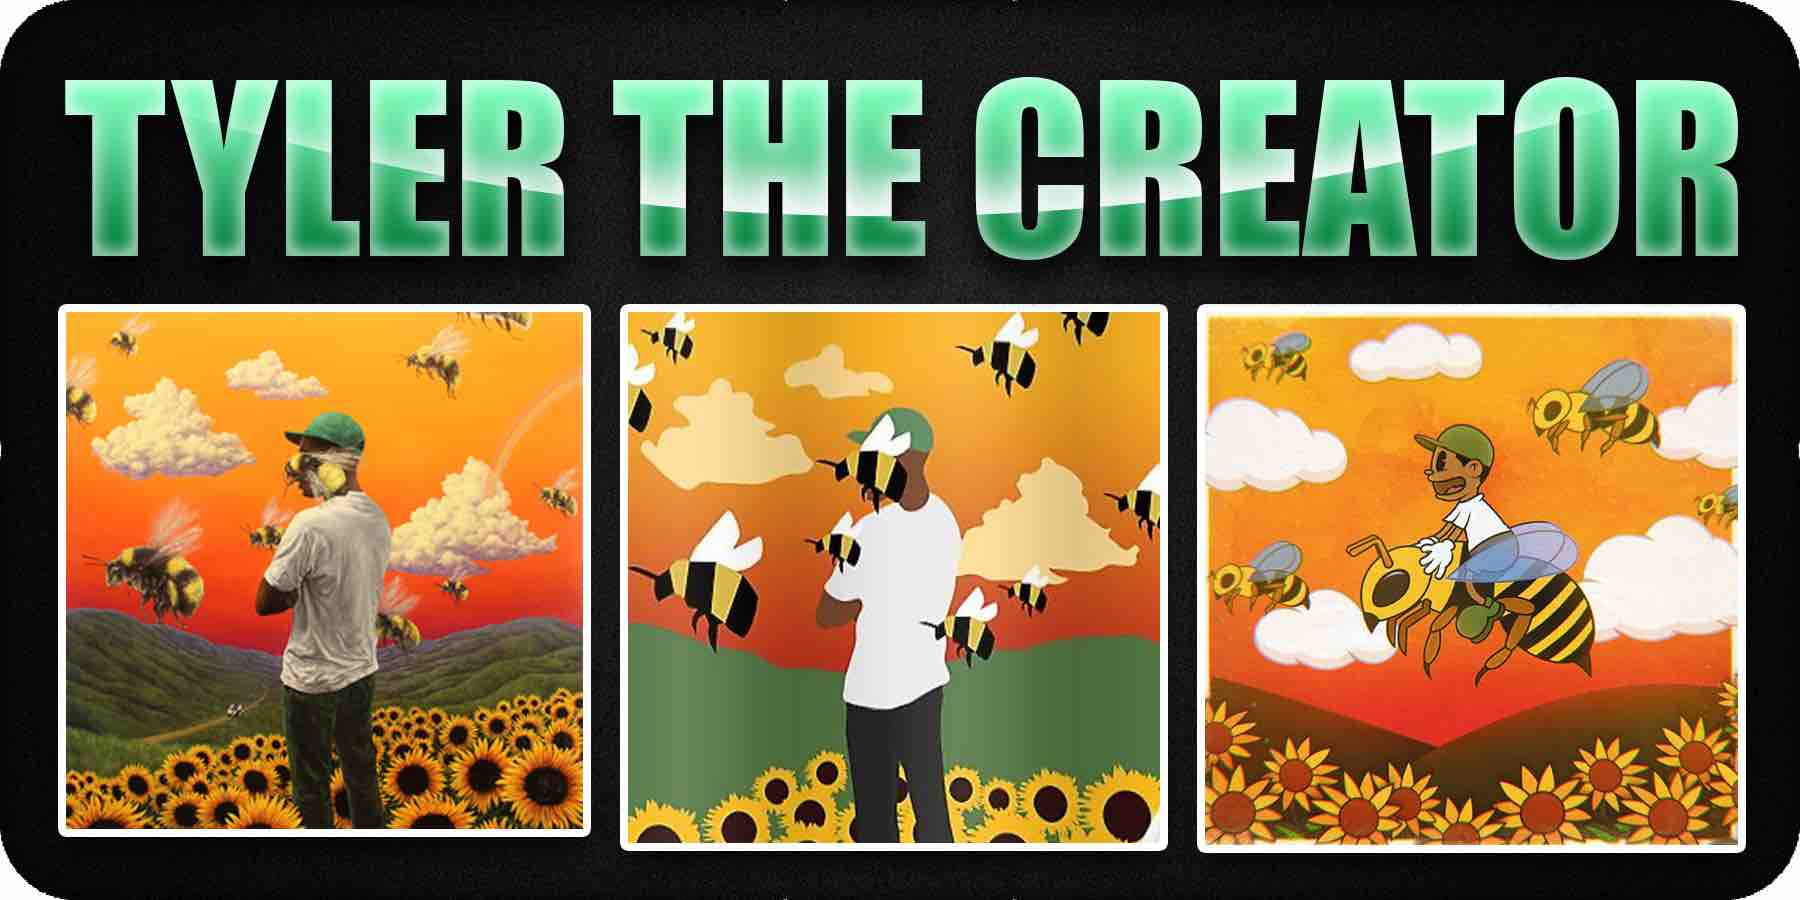 Tyler the creator cartoon album cover